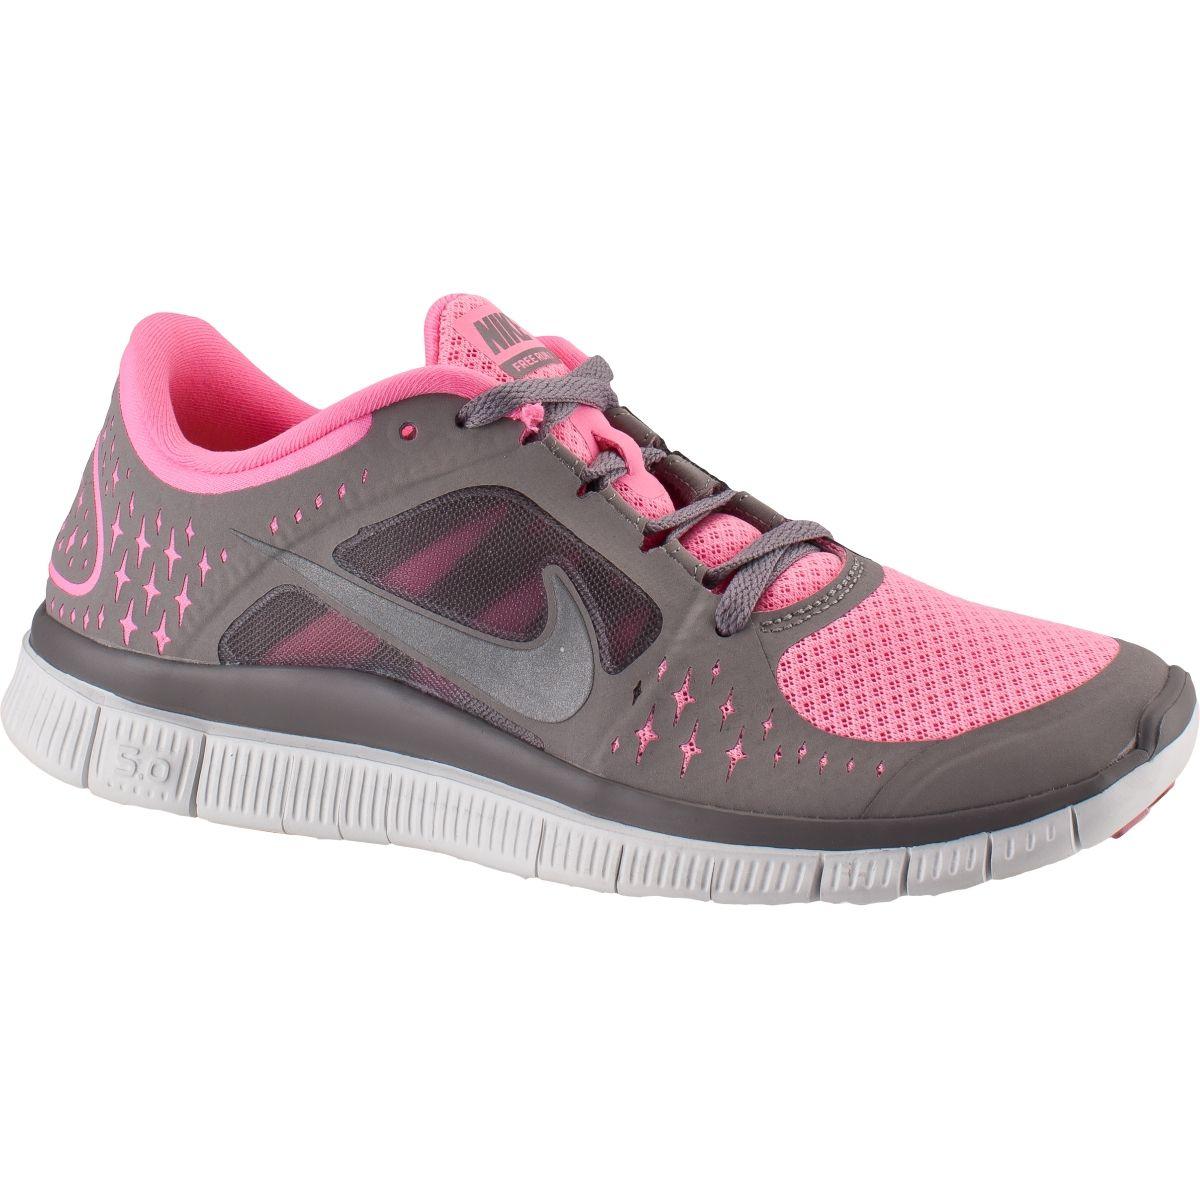 a763f04453083 low cost nike free run 3 running shoes womens sportchek e234f 8b774